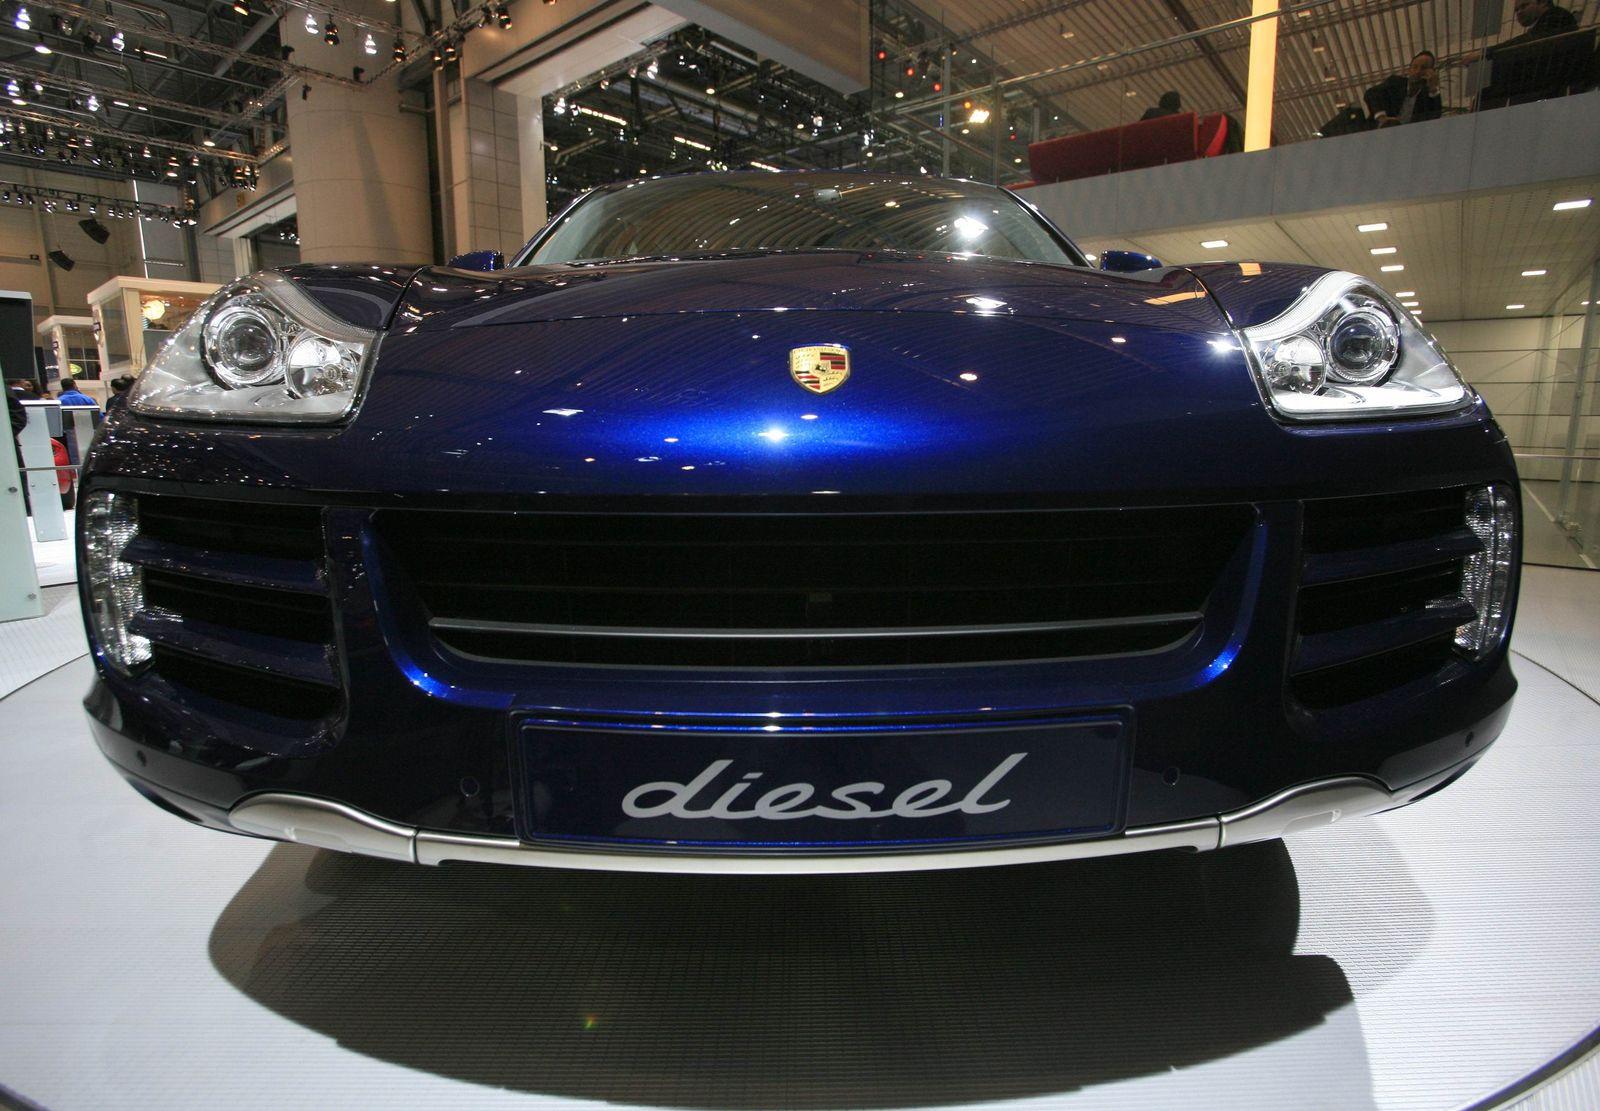 Volkswagen Porsche Diesel